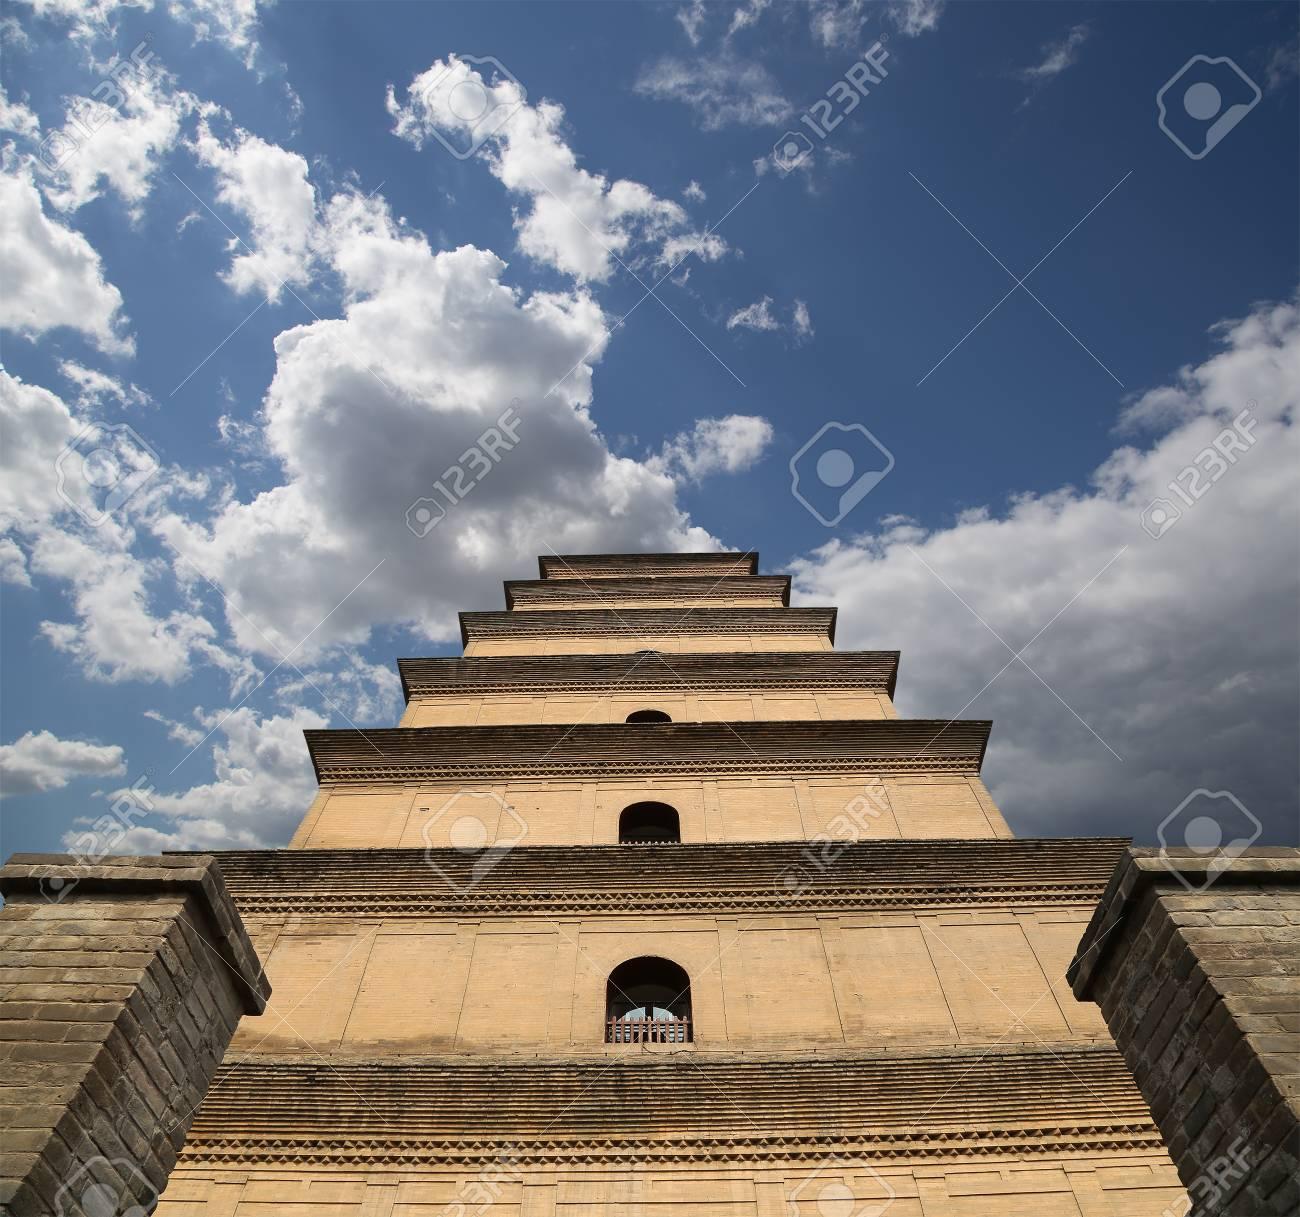 Giant Wild Goose Pagoda (Big Wild Goose Pagoda), is a Buddhist pagoda located in southern Xian (Sian, Xi'an), Shaanxi province, China Stock Photo - 24616550